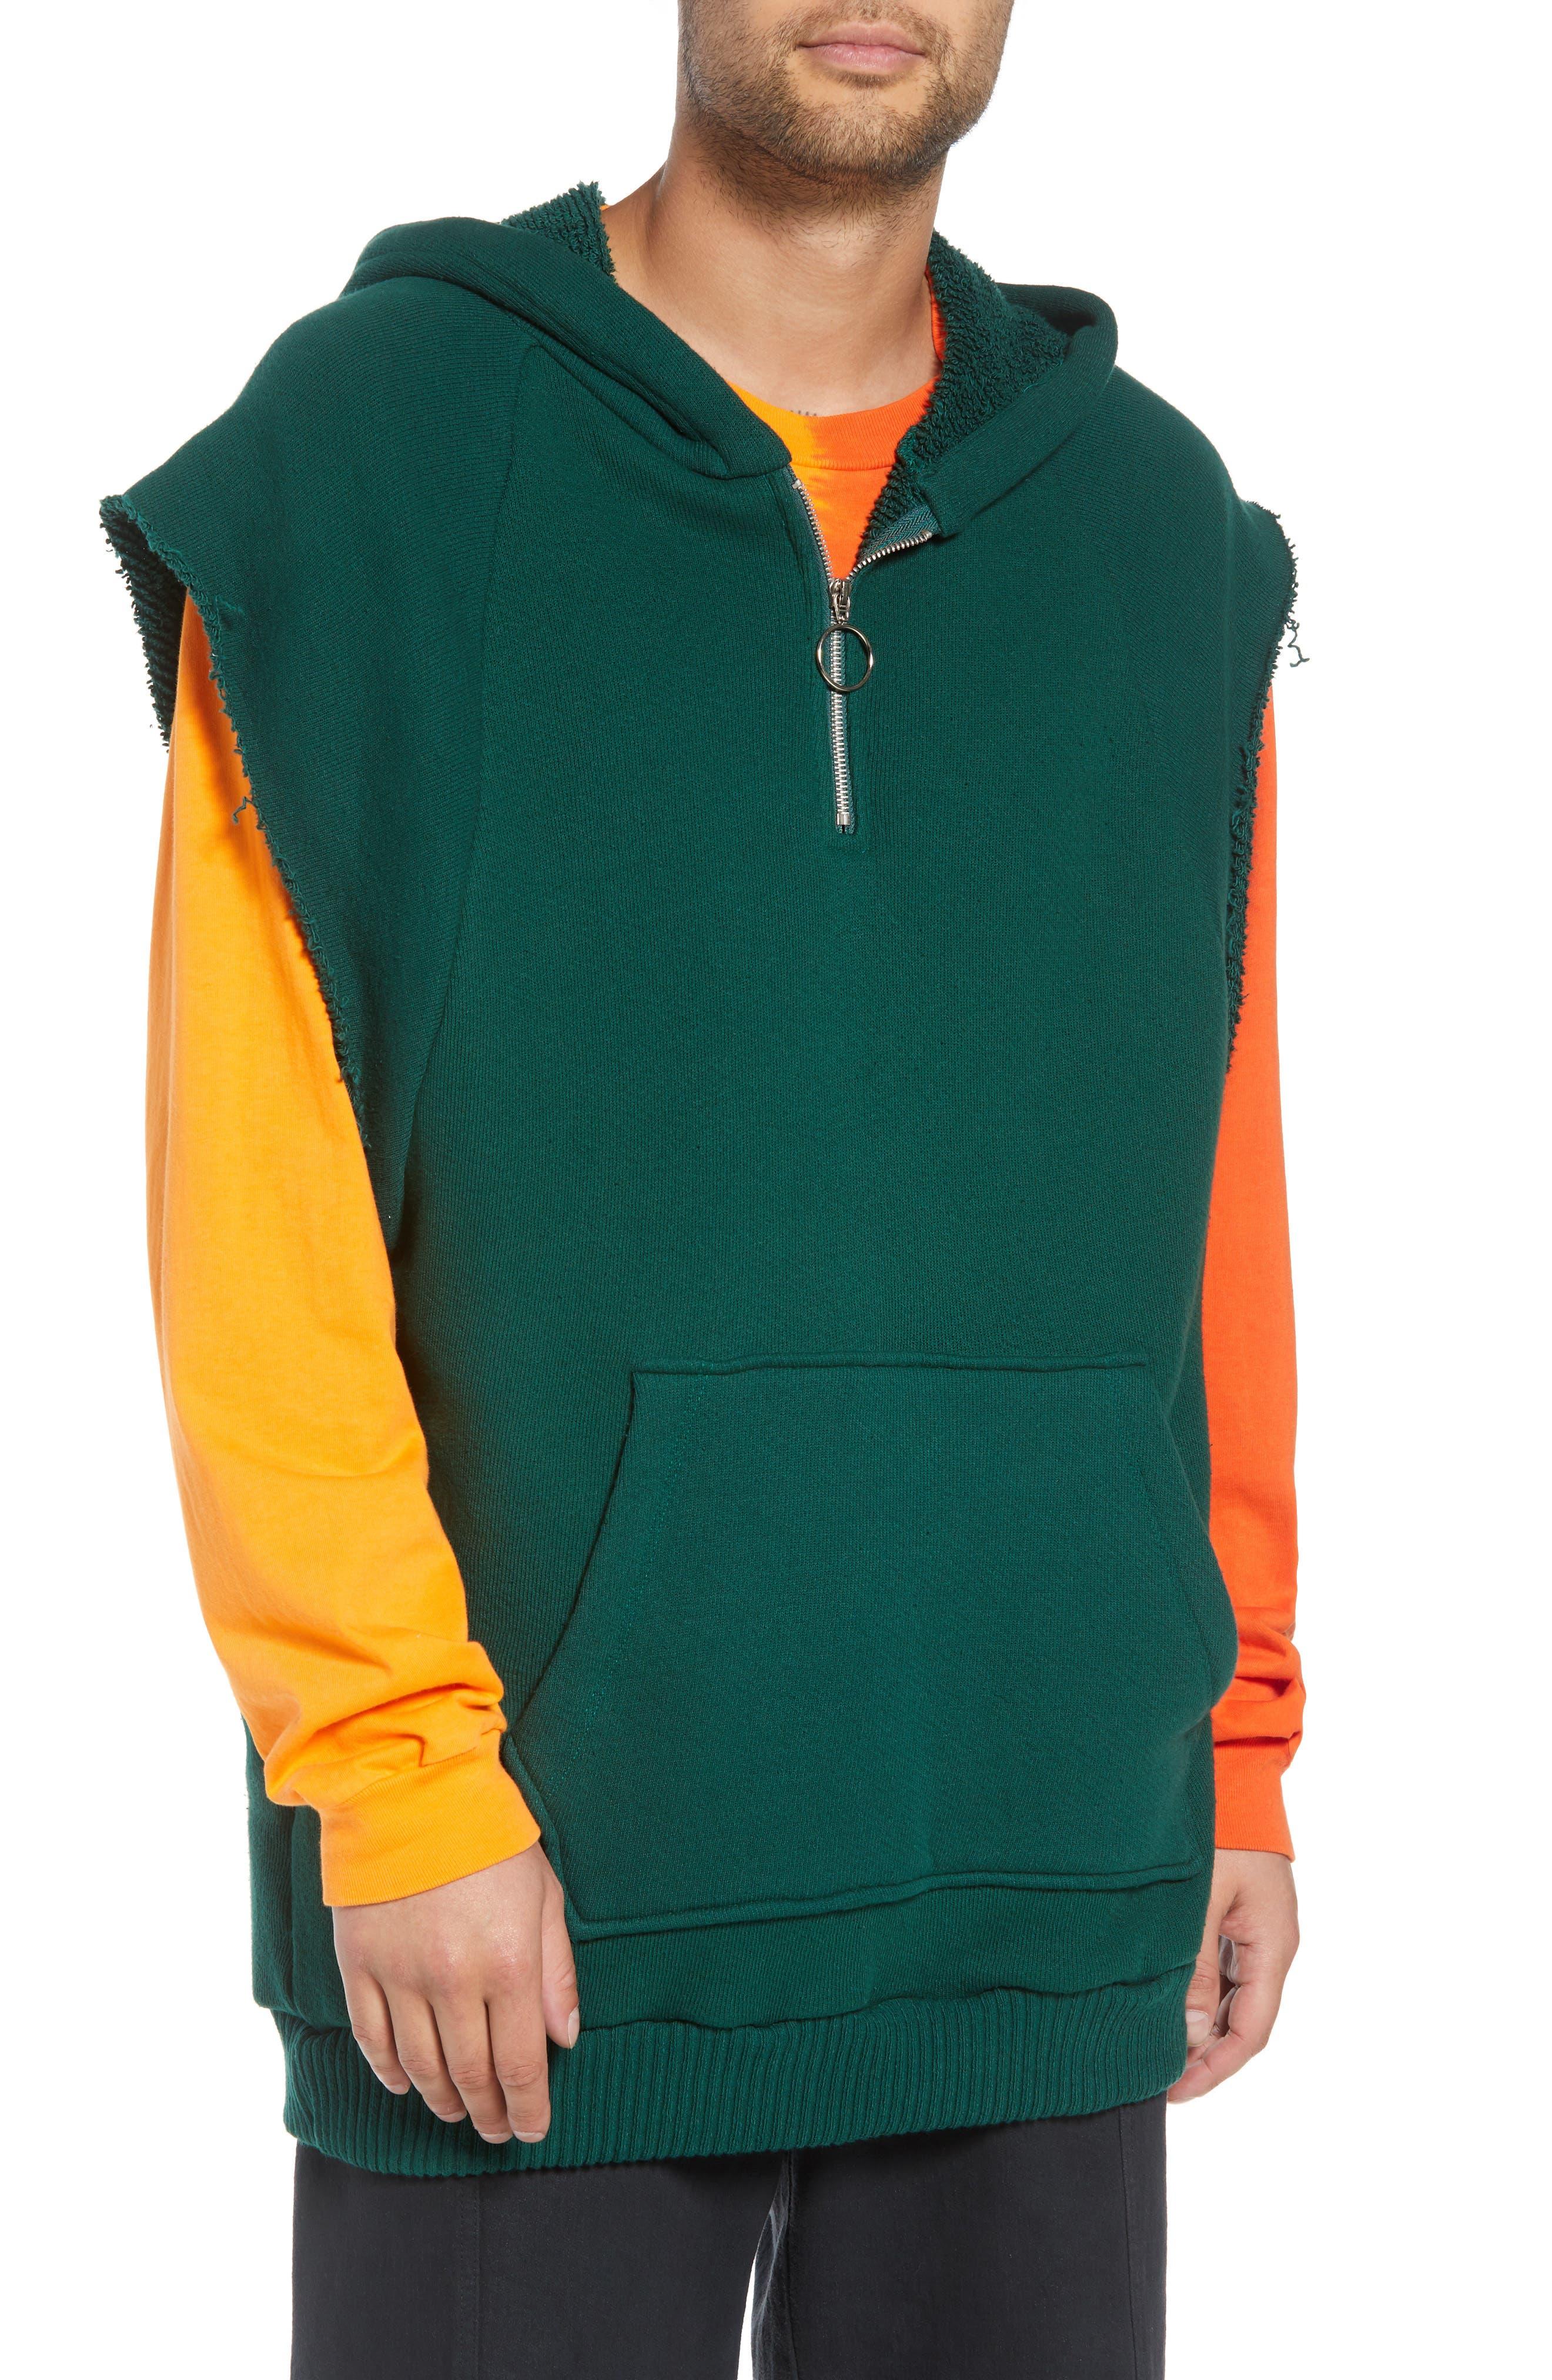 DRIFTER Warwick Quarter-Zip Hoodie Sweatshirt in Hunter Green